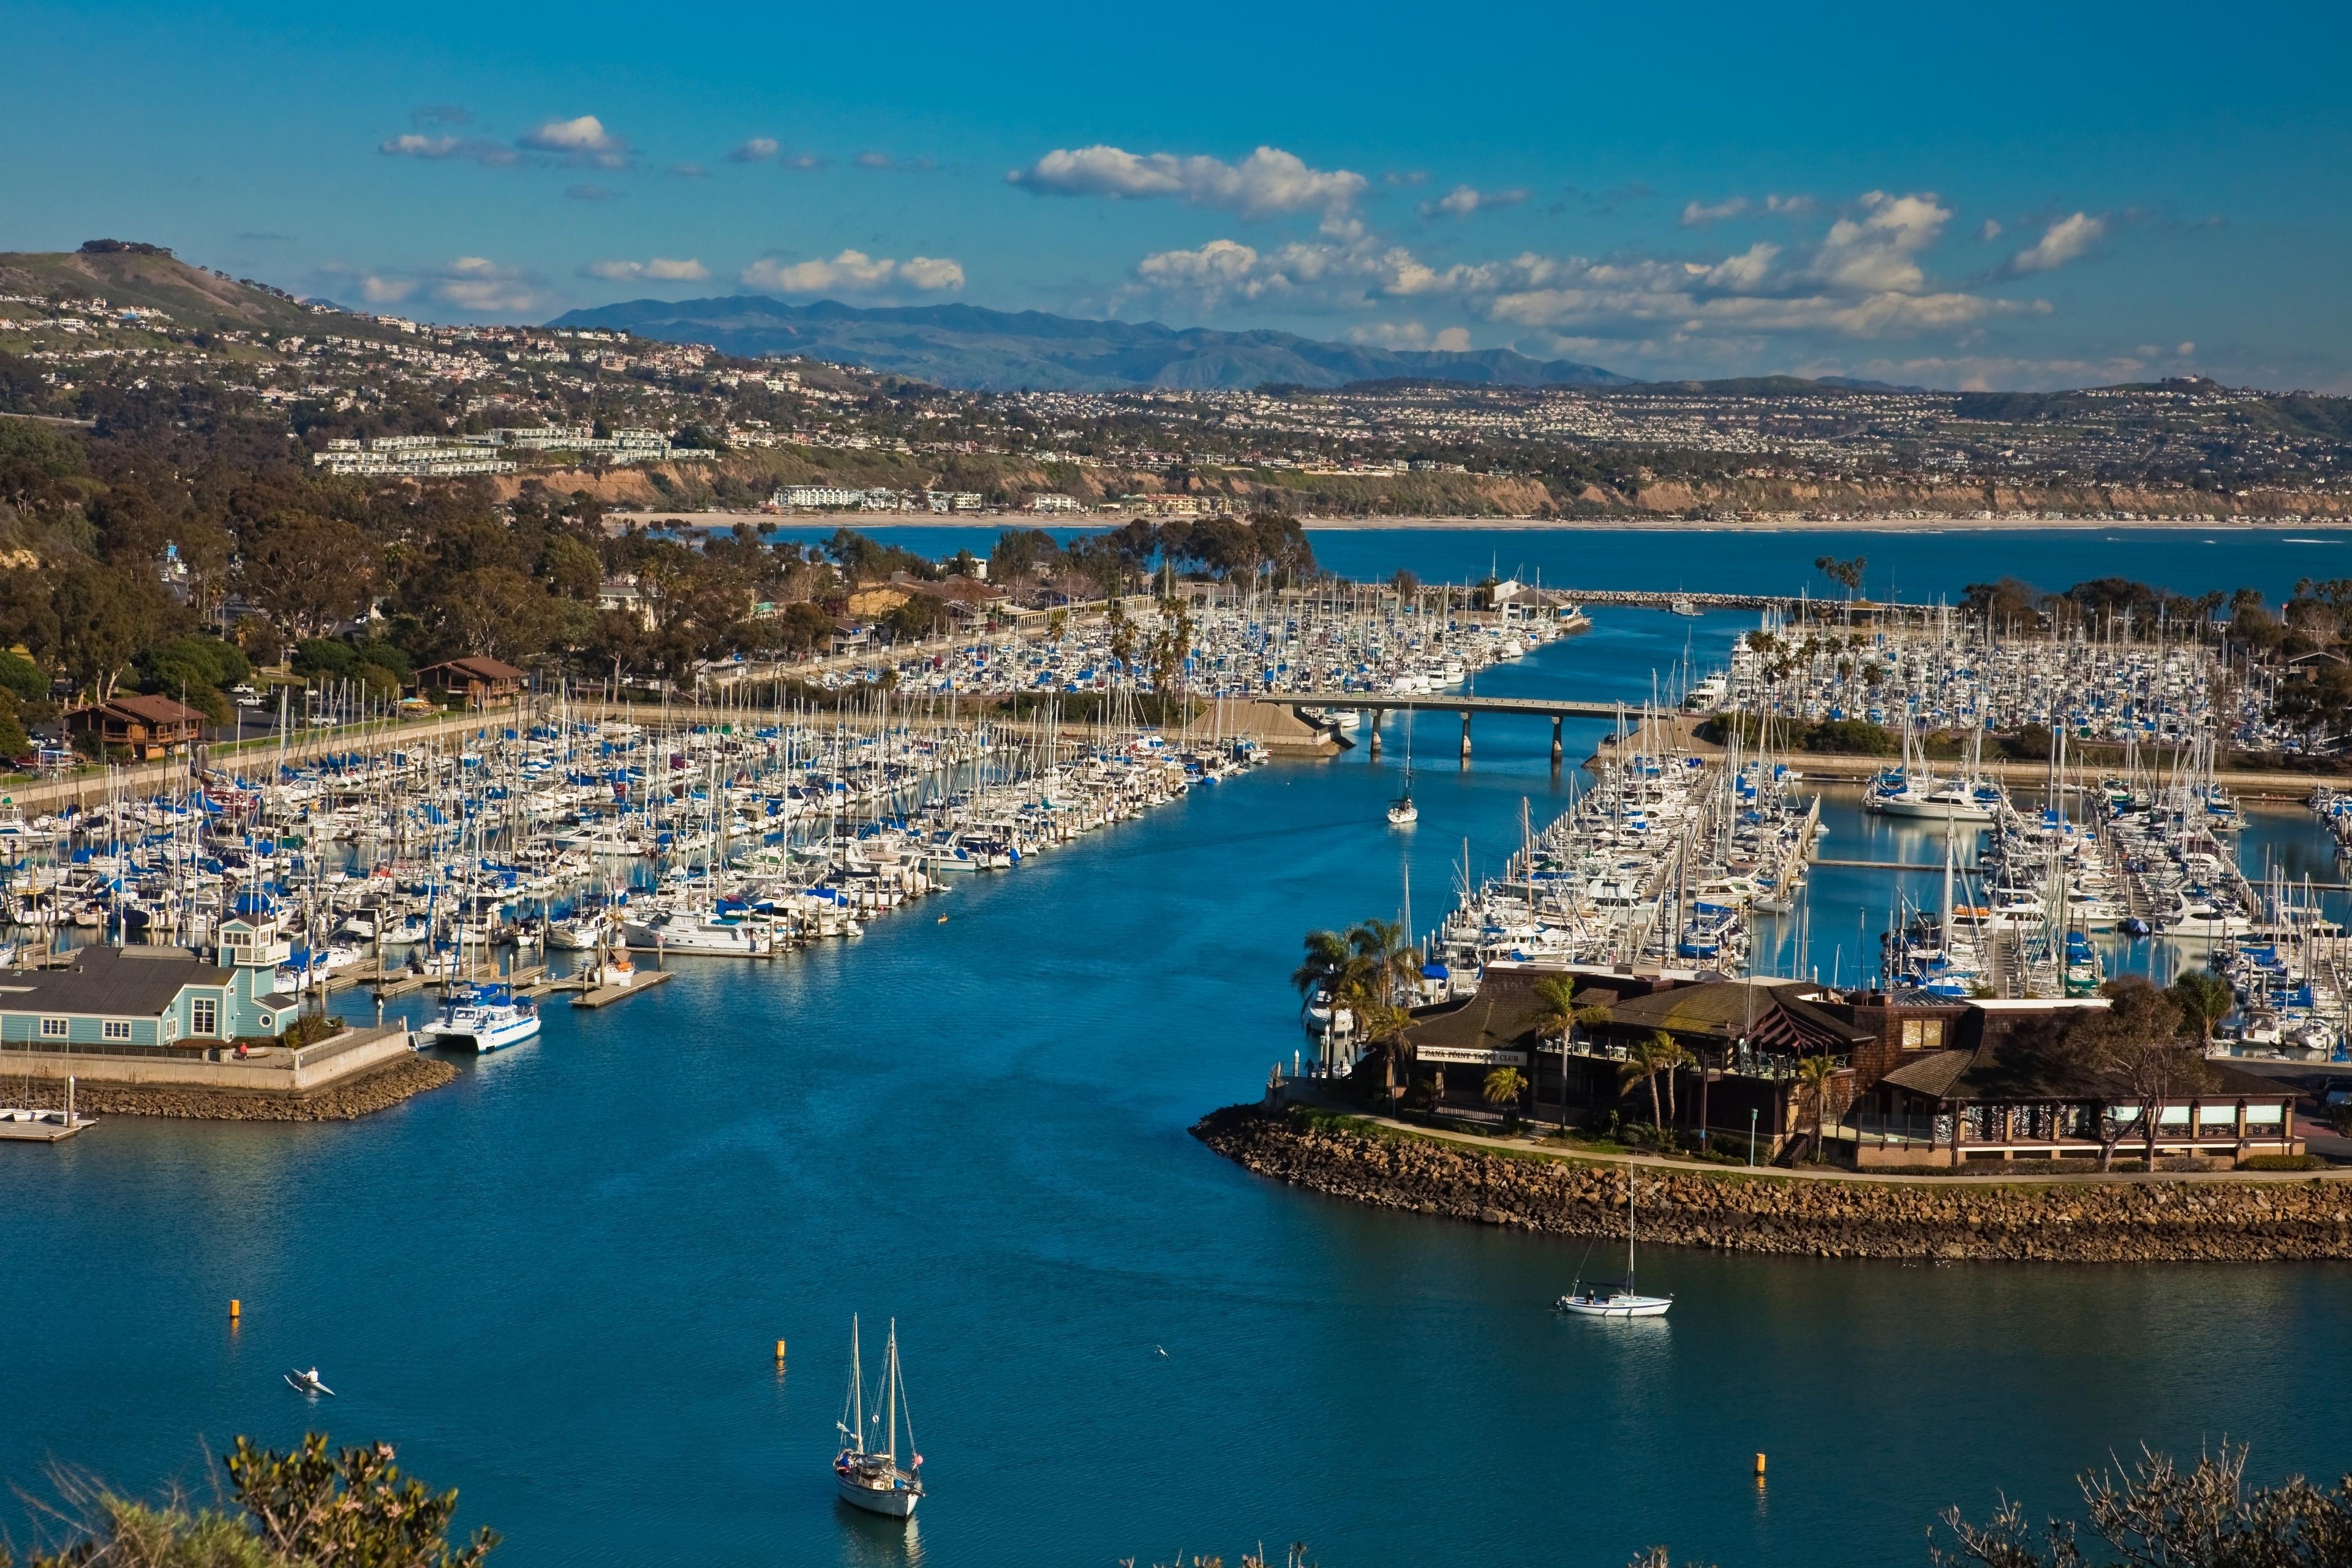 Dana Point, California, United States of America